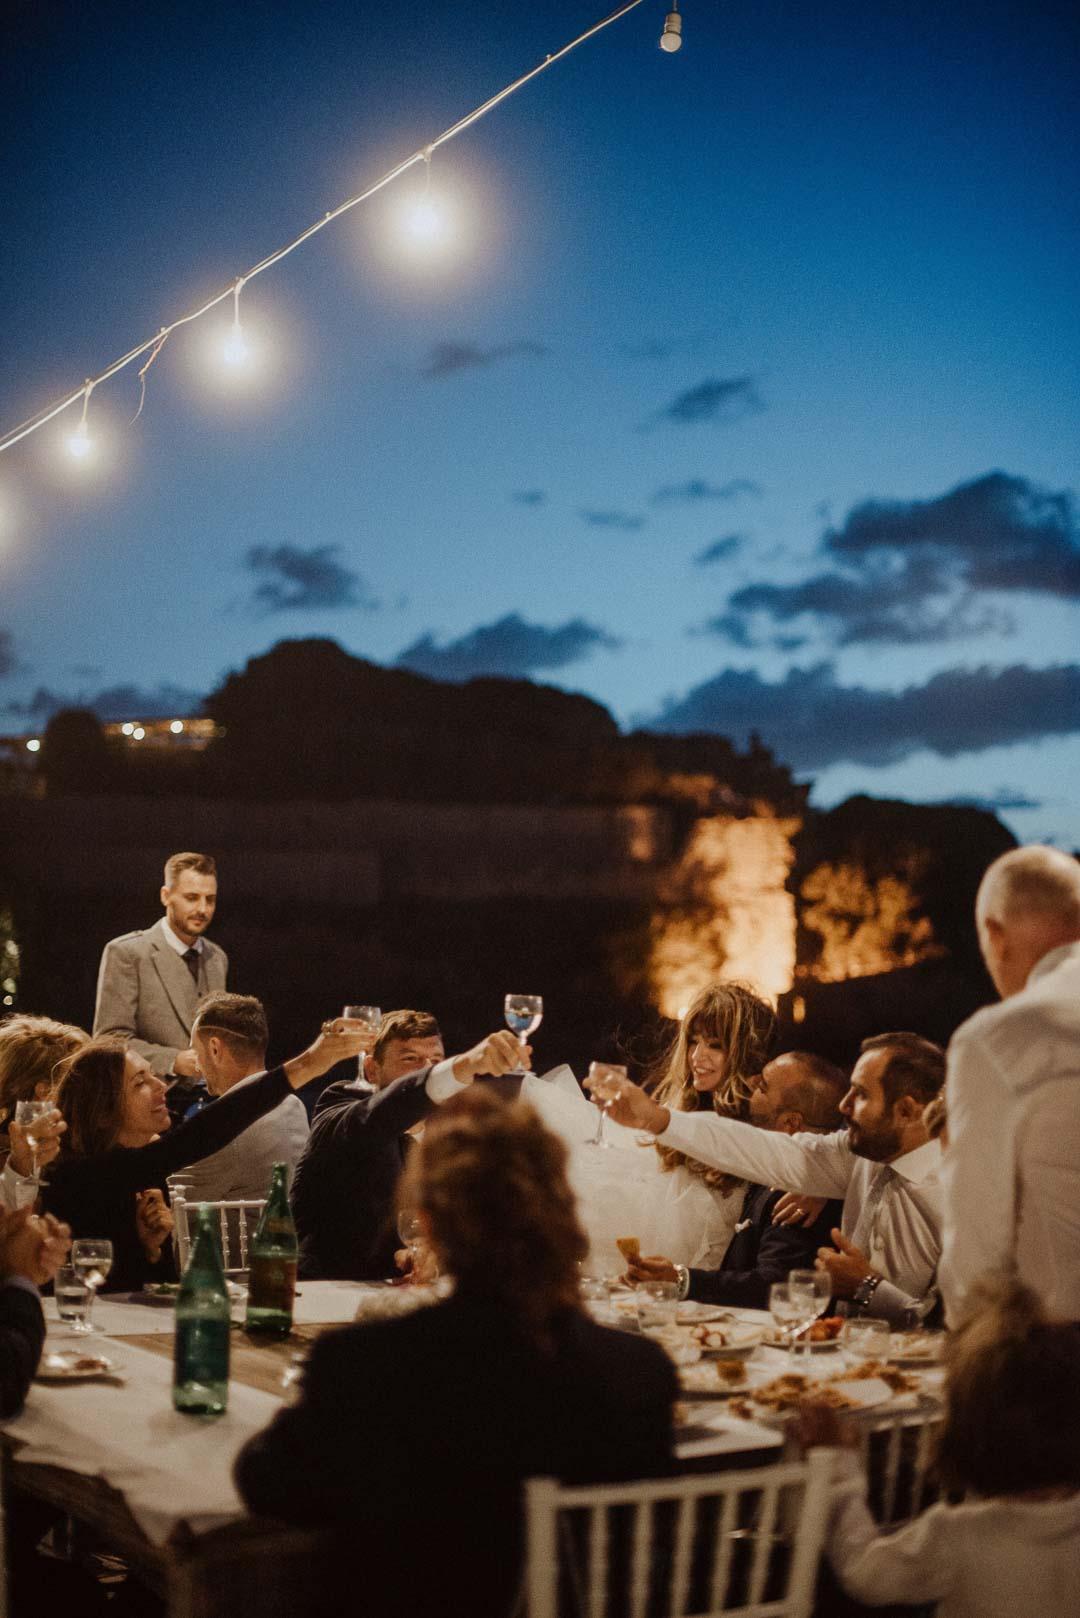 wedding-photographer-destination-fineart-bespoke-reportage-napoli-nabilah-vivianeizzo-spazio46-155